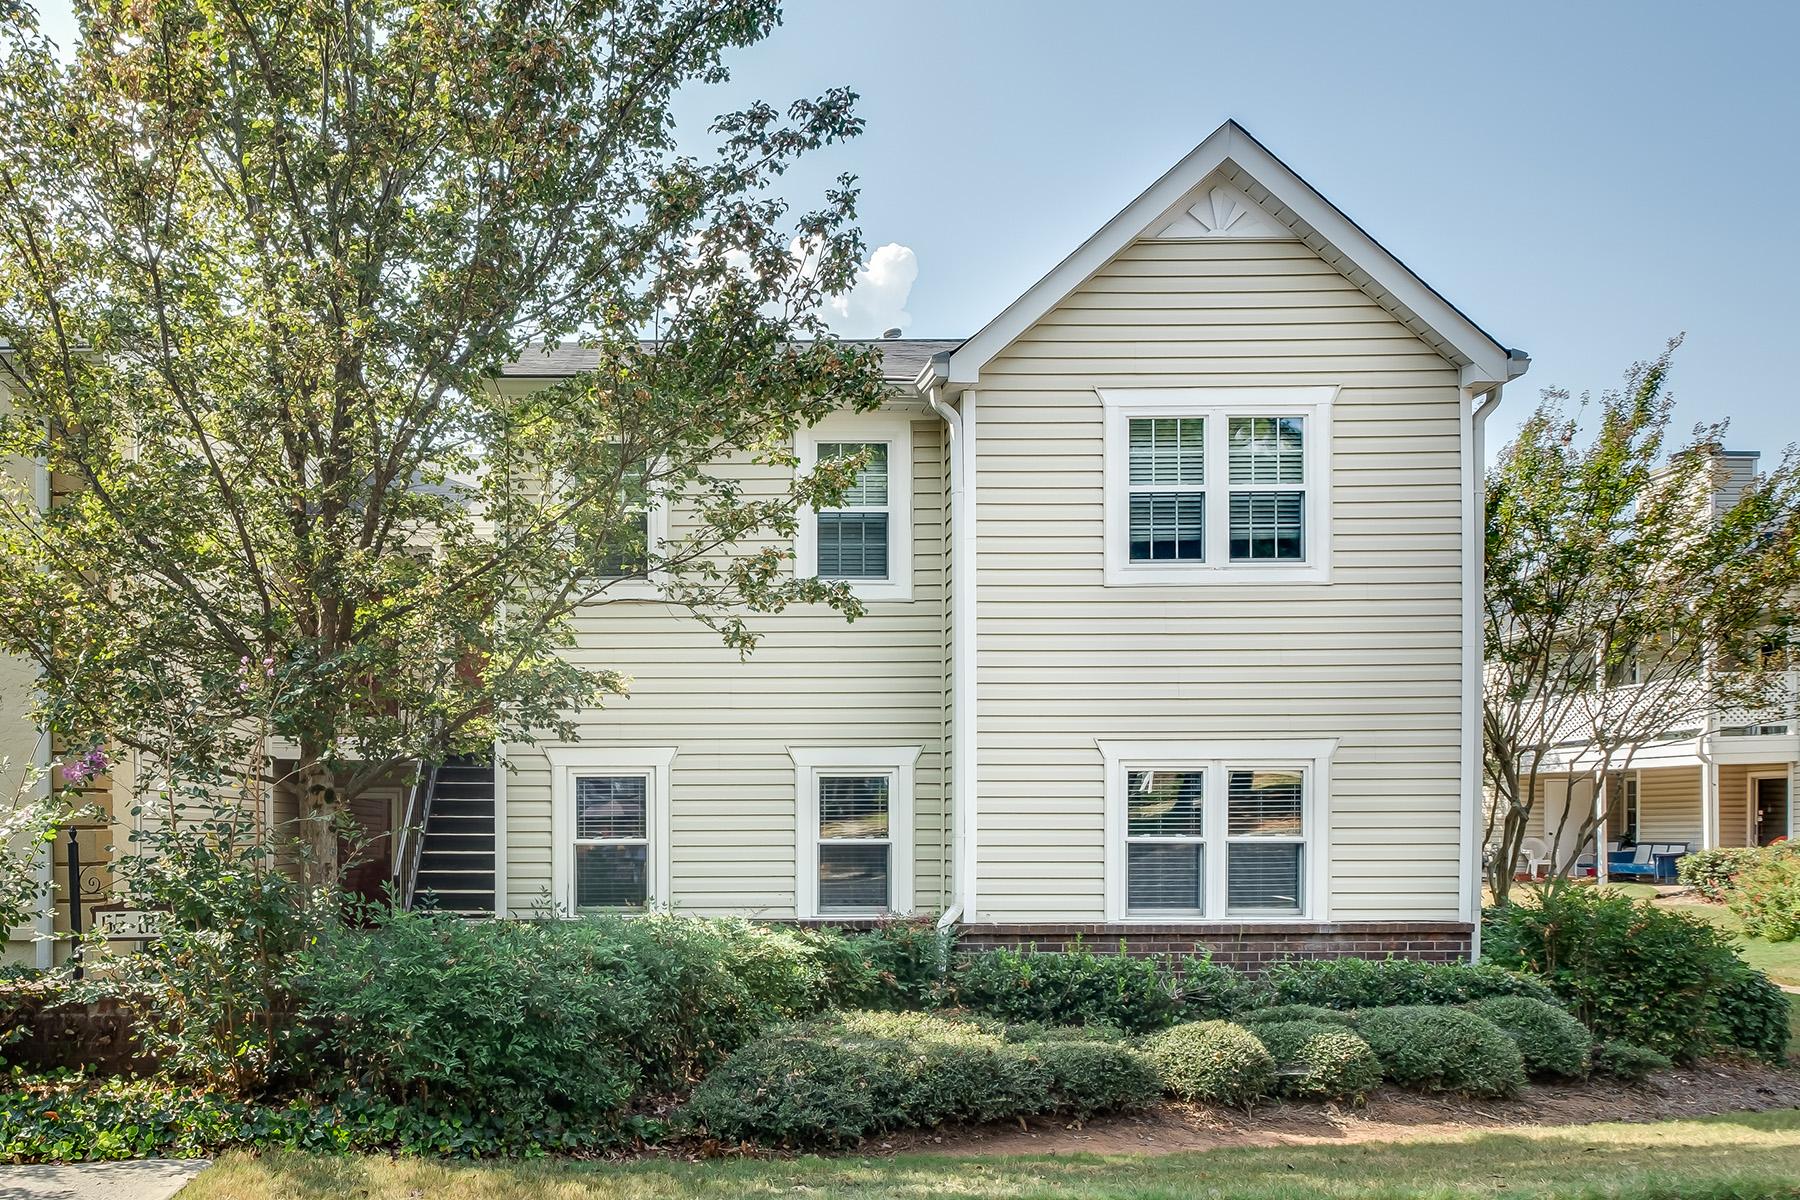 Condominiums のために 売買 アット Rare Ground Level Unit Available at the Condos of Avondale Estates 67 Hampshire Ct, Avondale Estates, ジョージア 30002 アメリカ